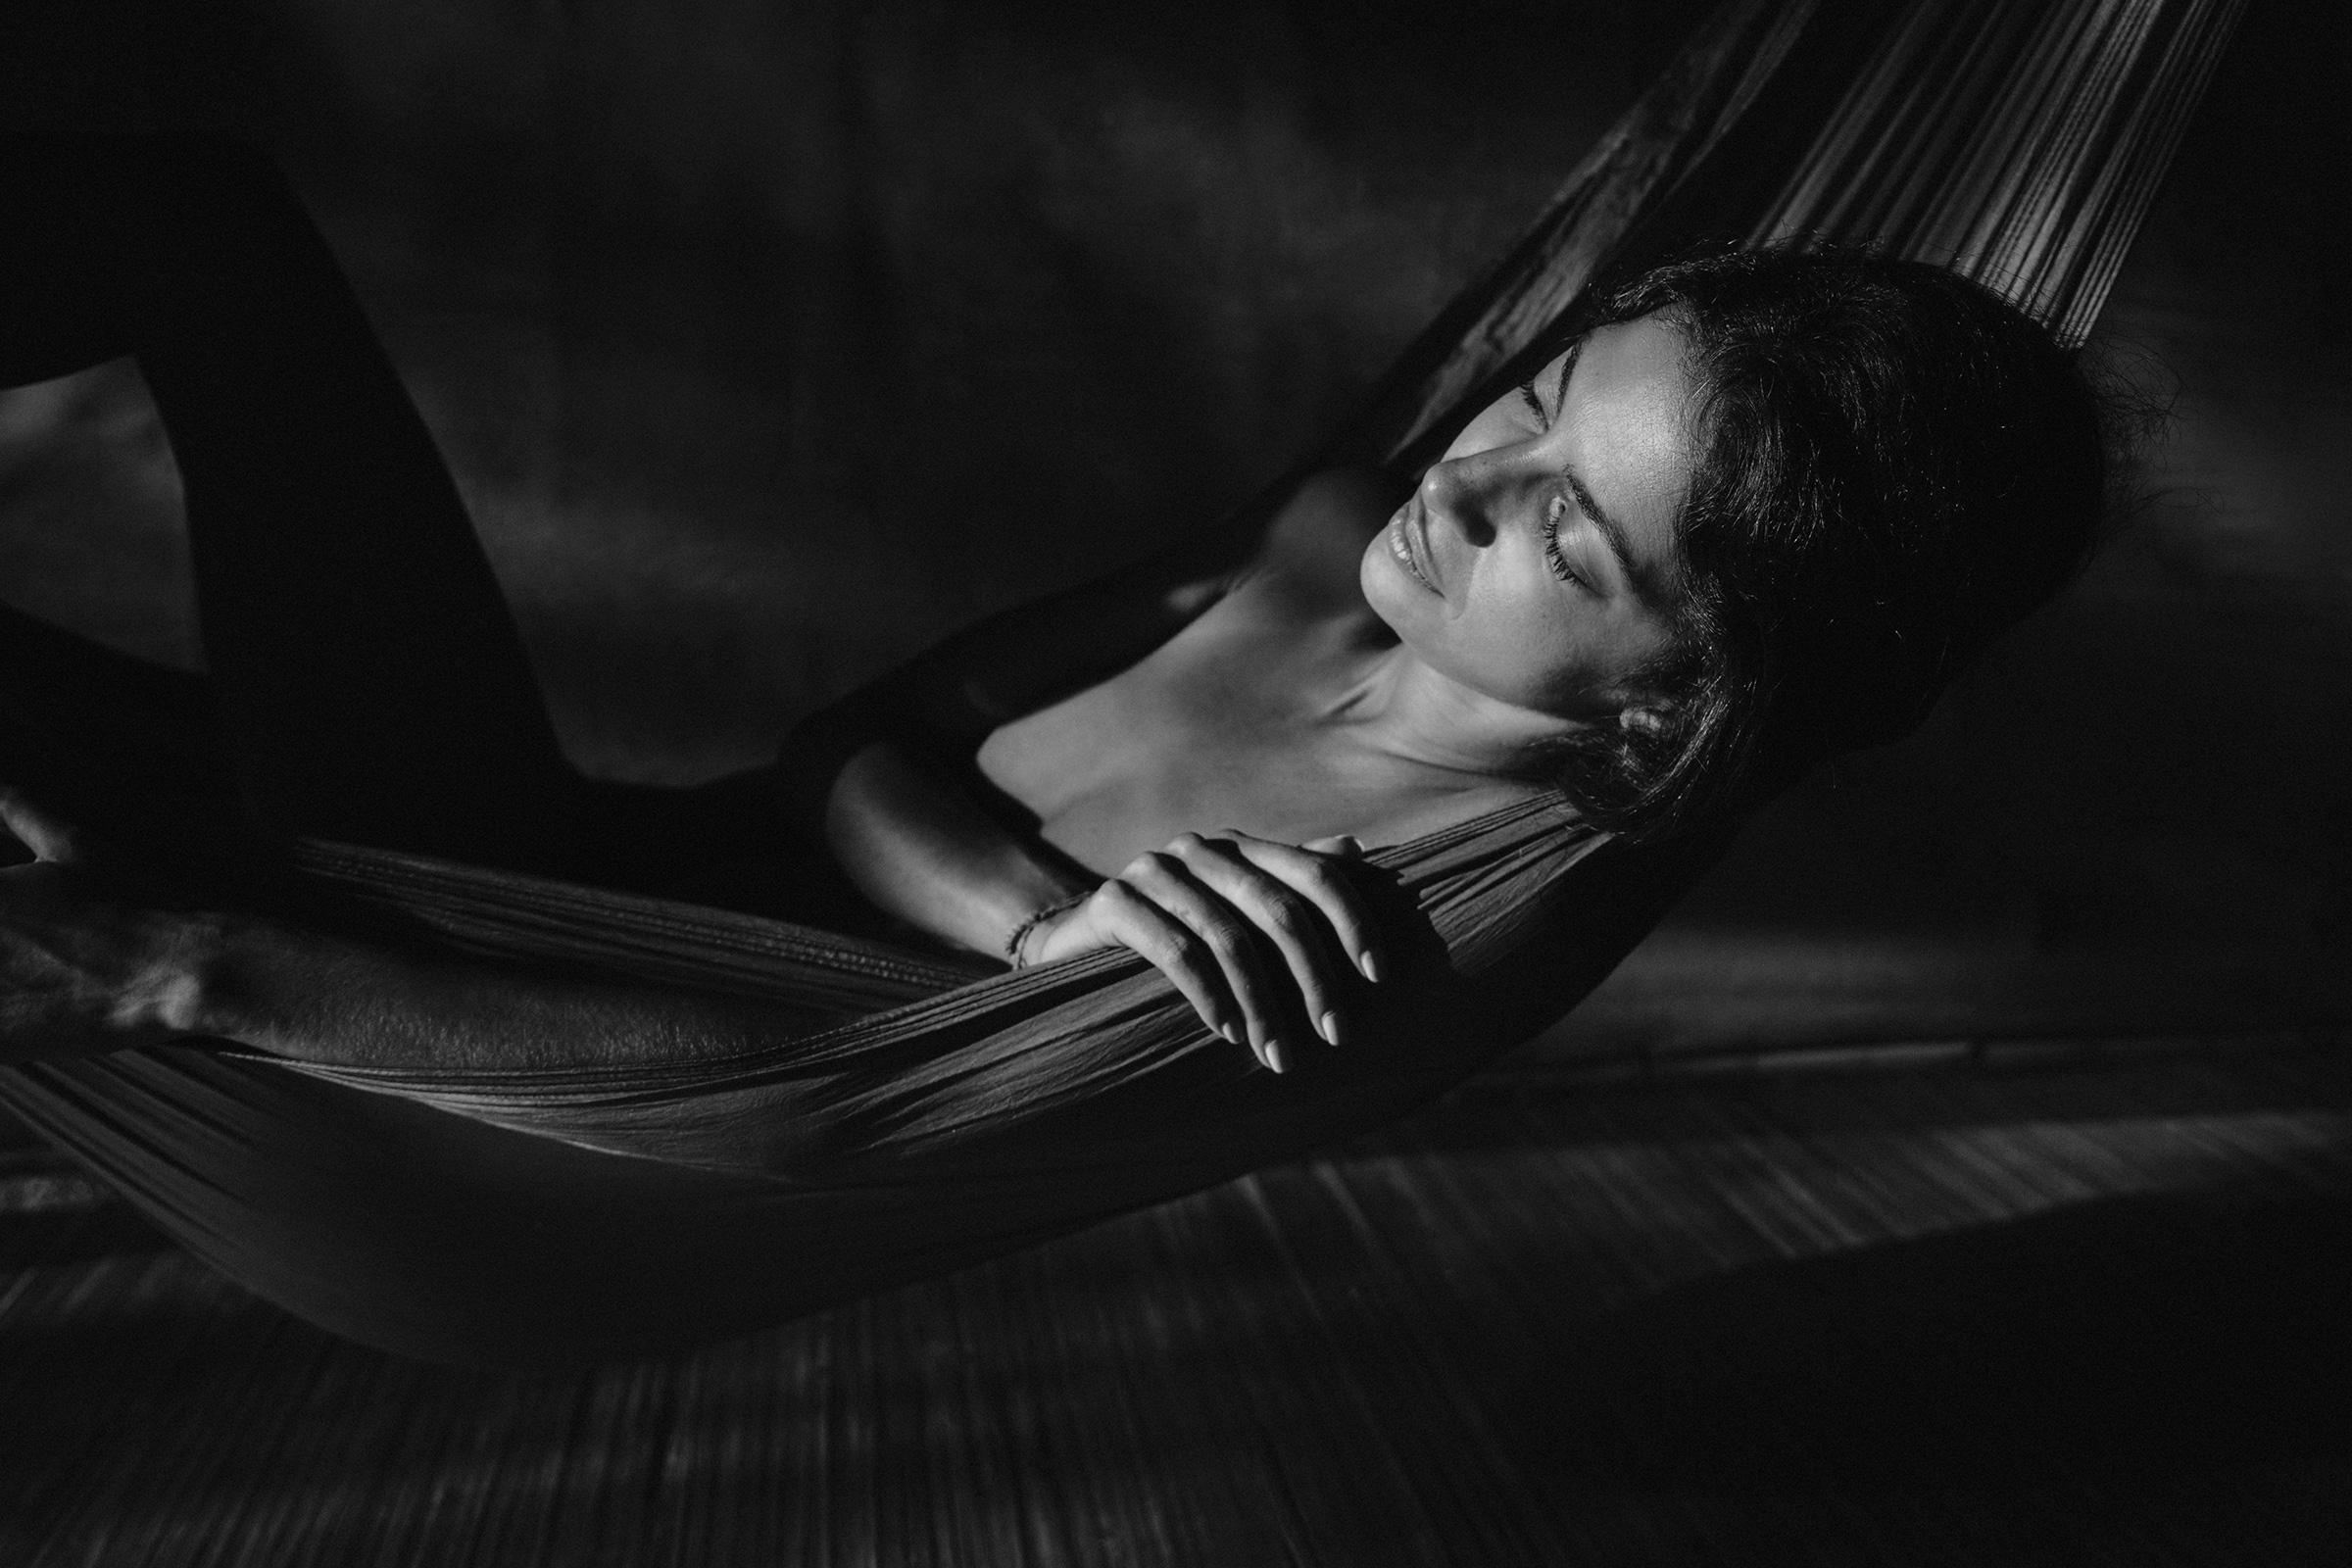 Kenza in hammock